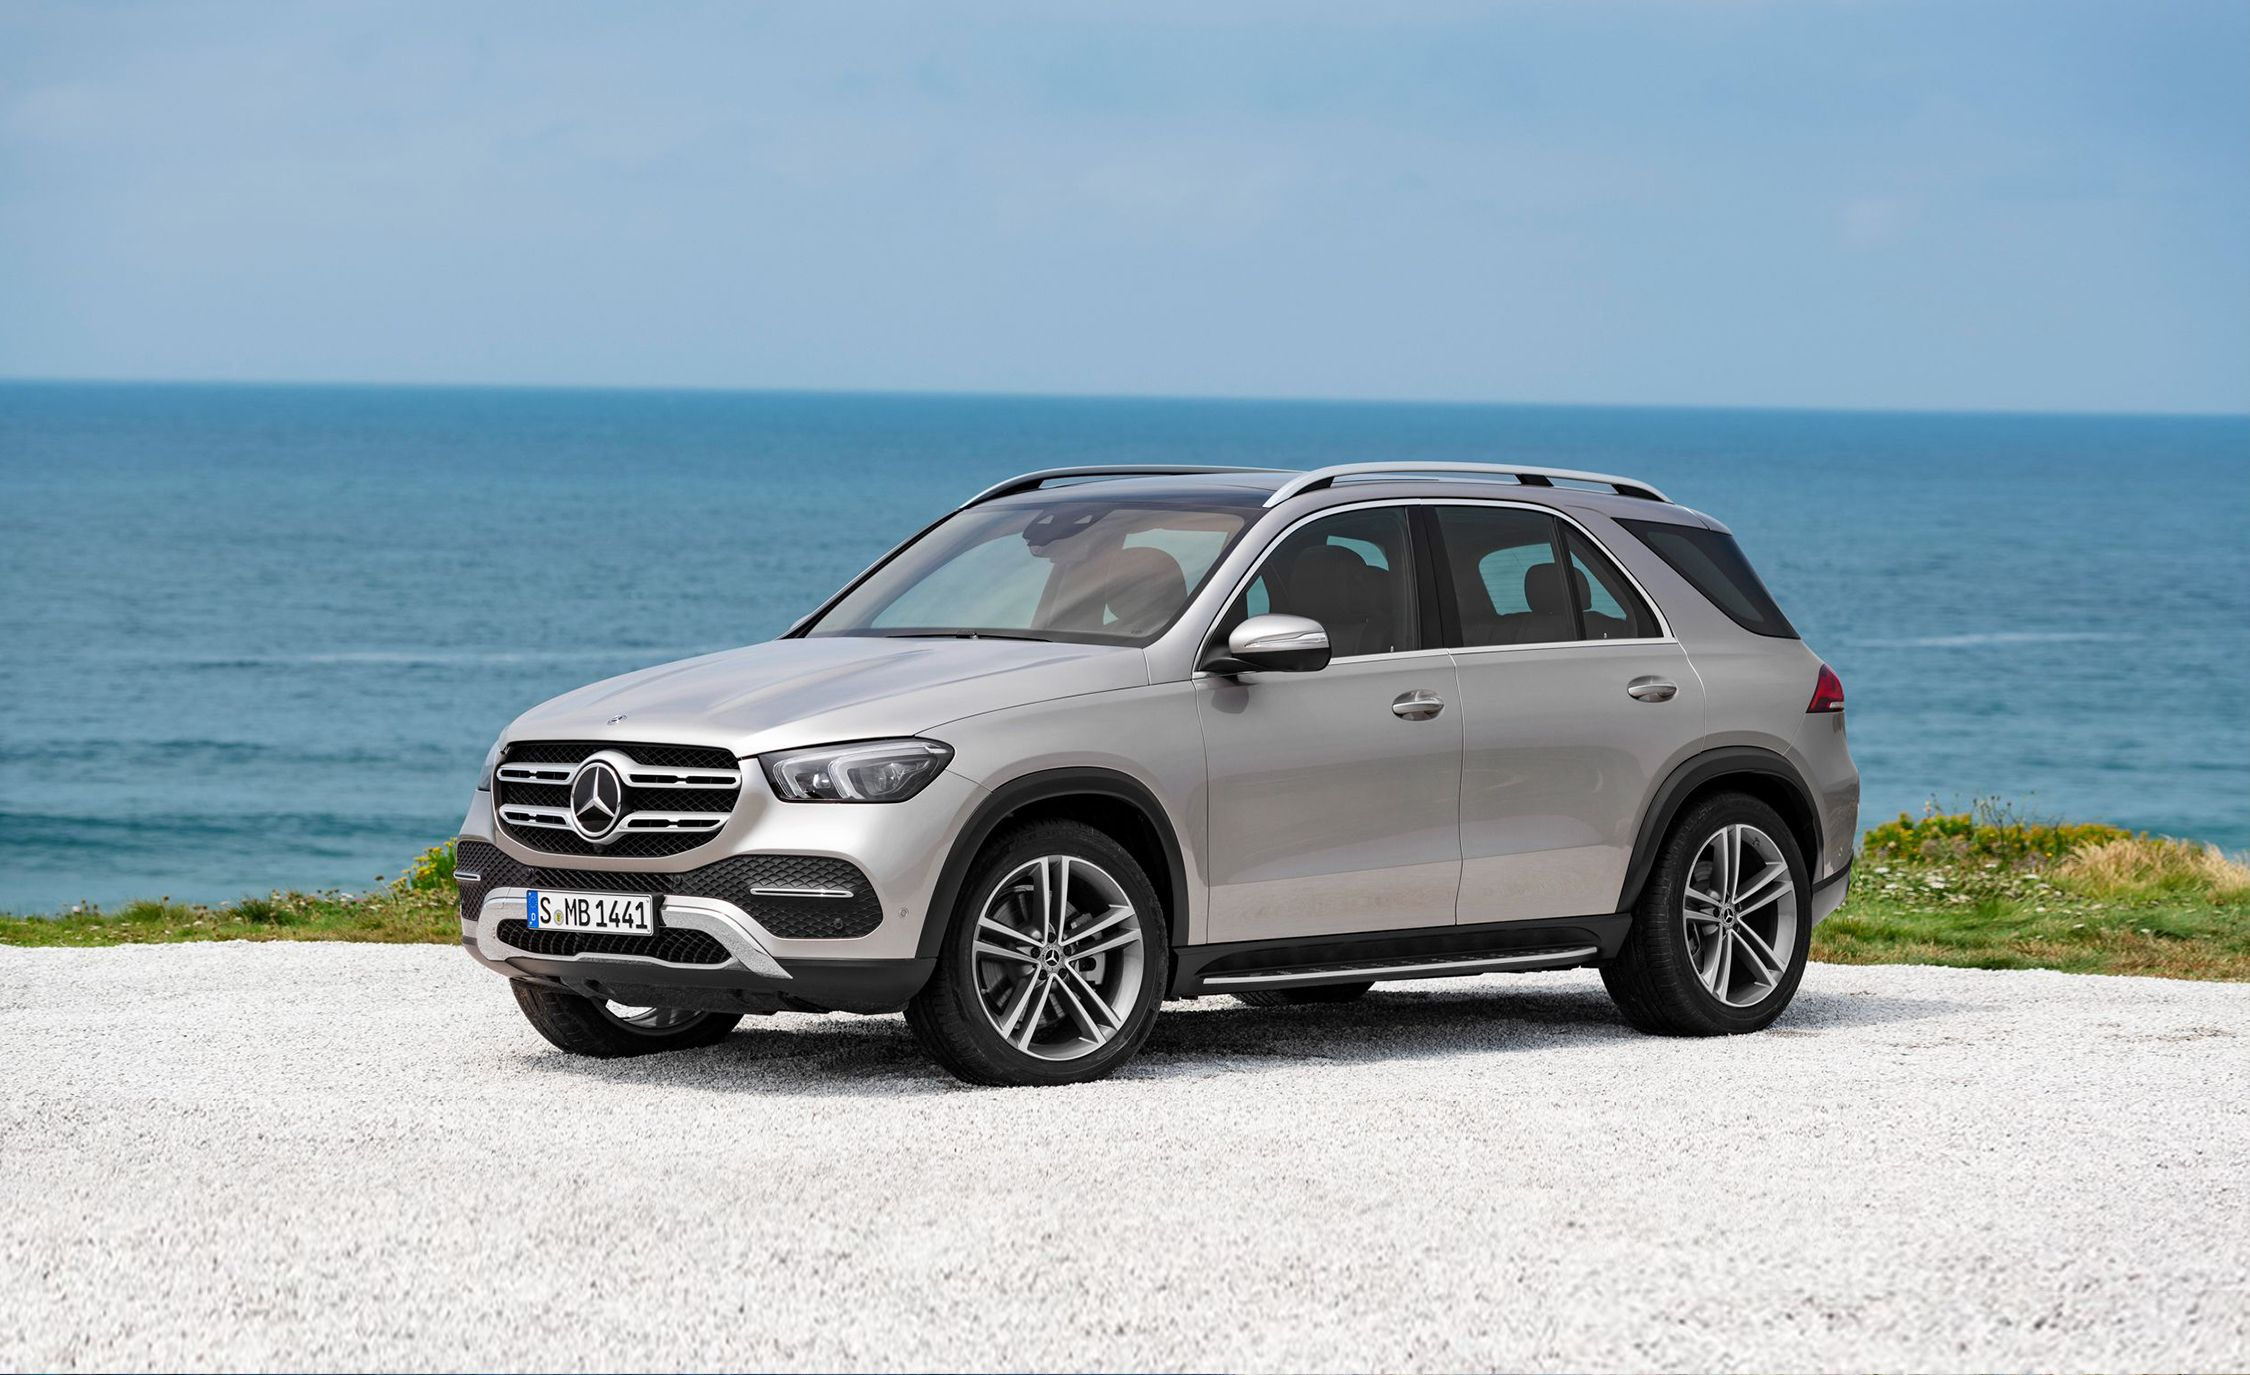 2020 Mercedes Benz Gle Cl Reviews Price Photos And Specs Car Driver